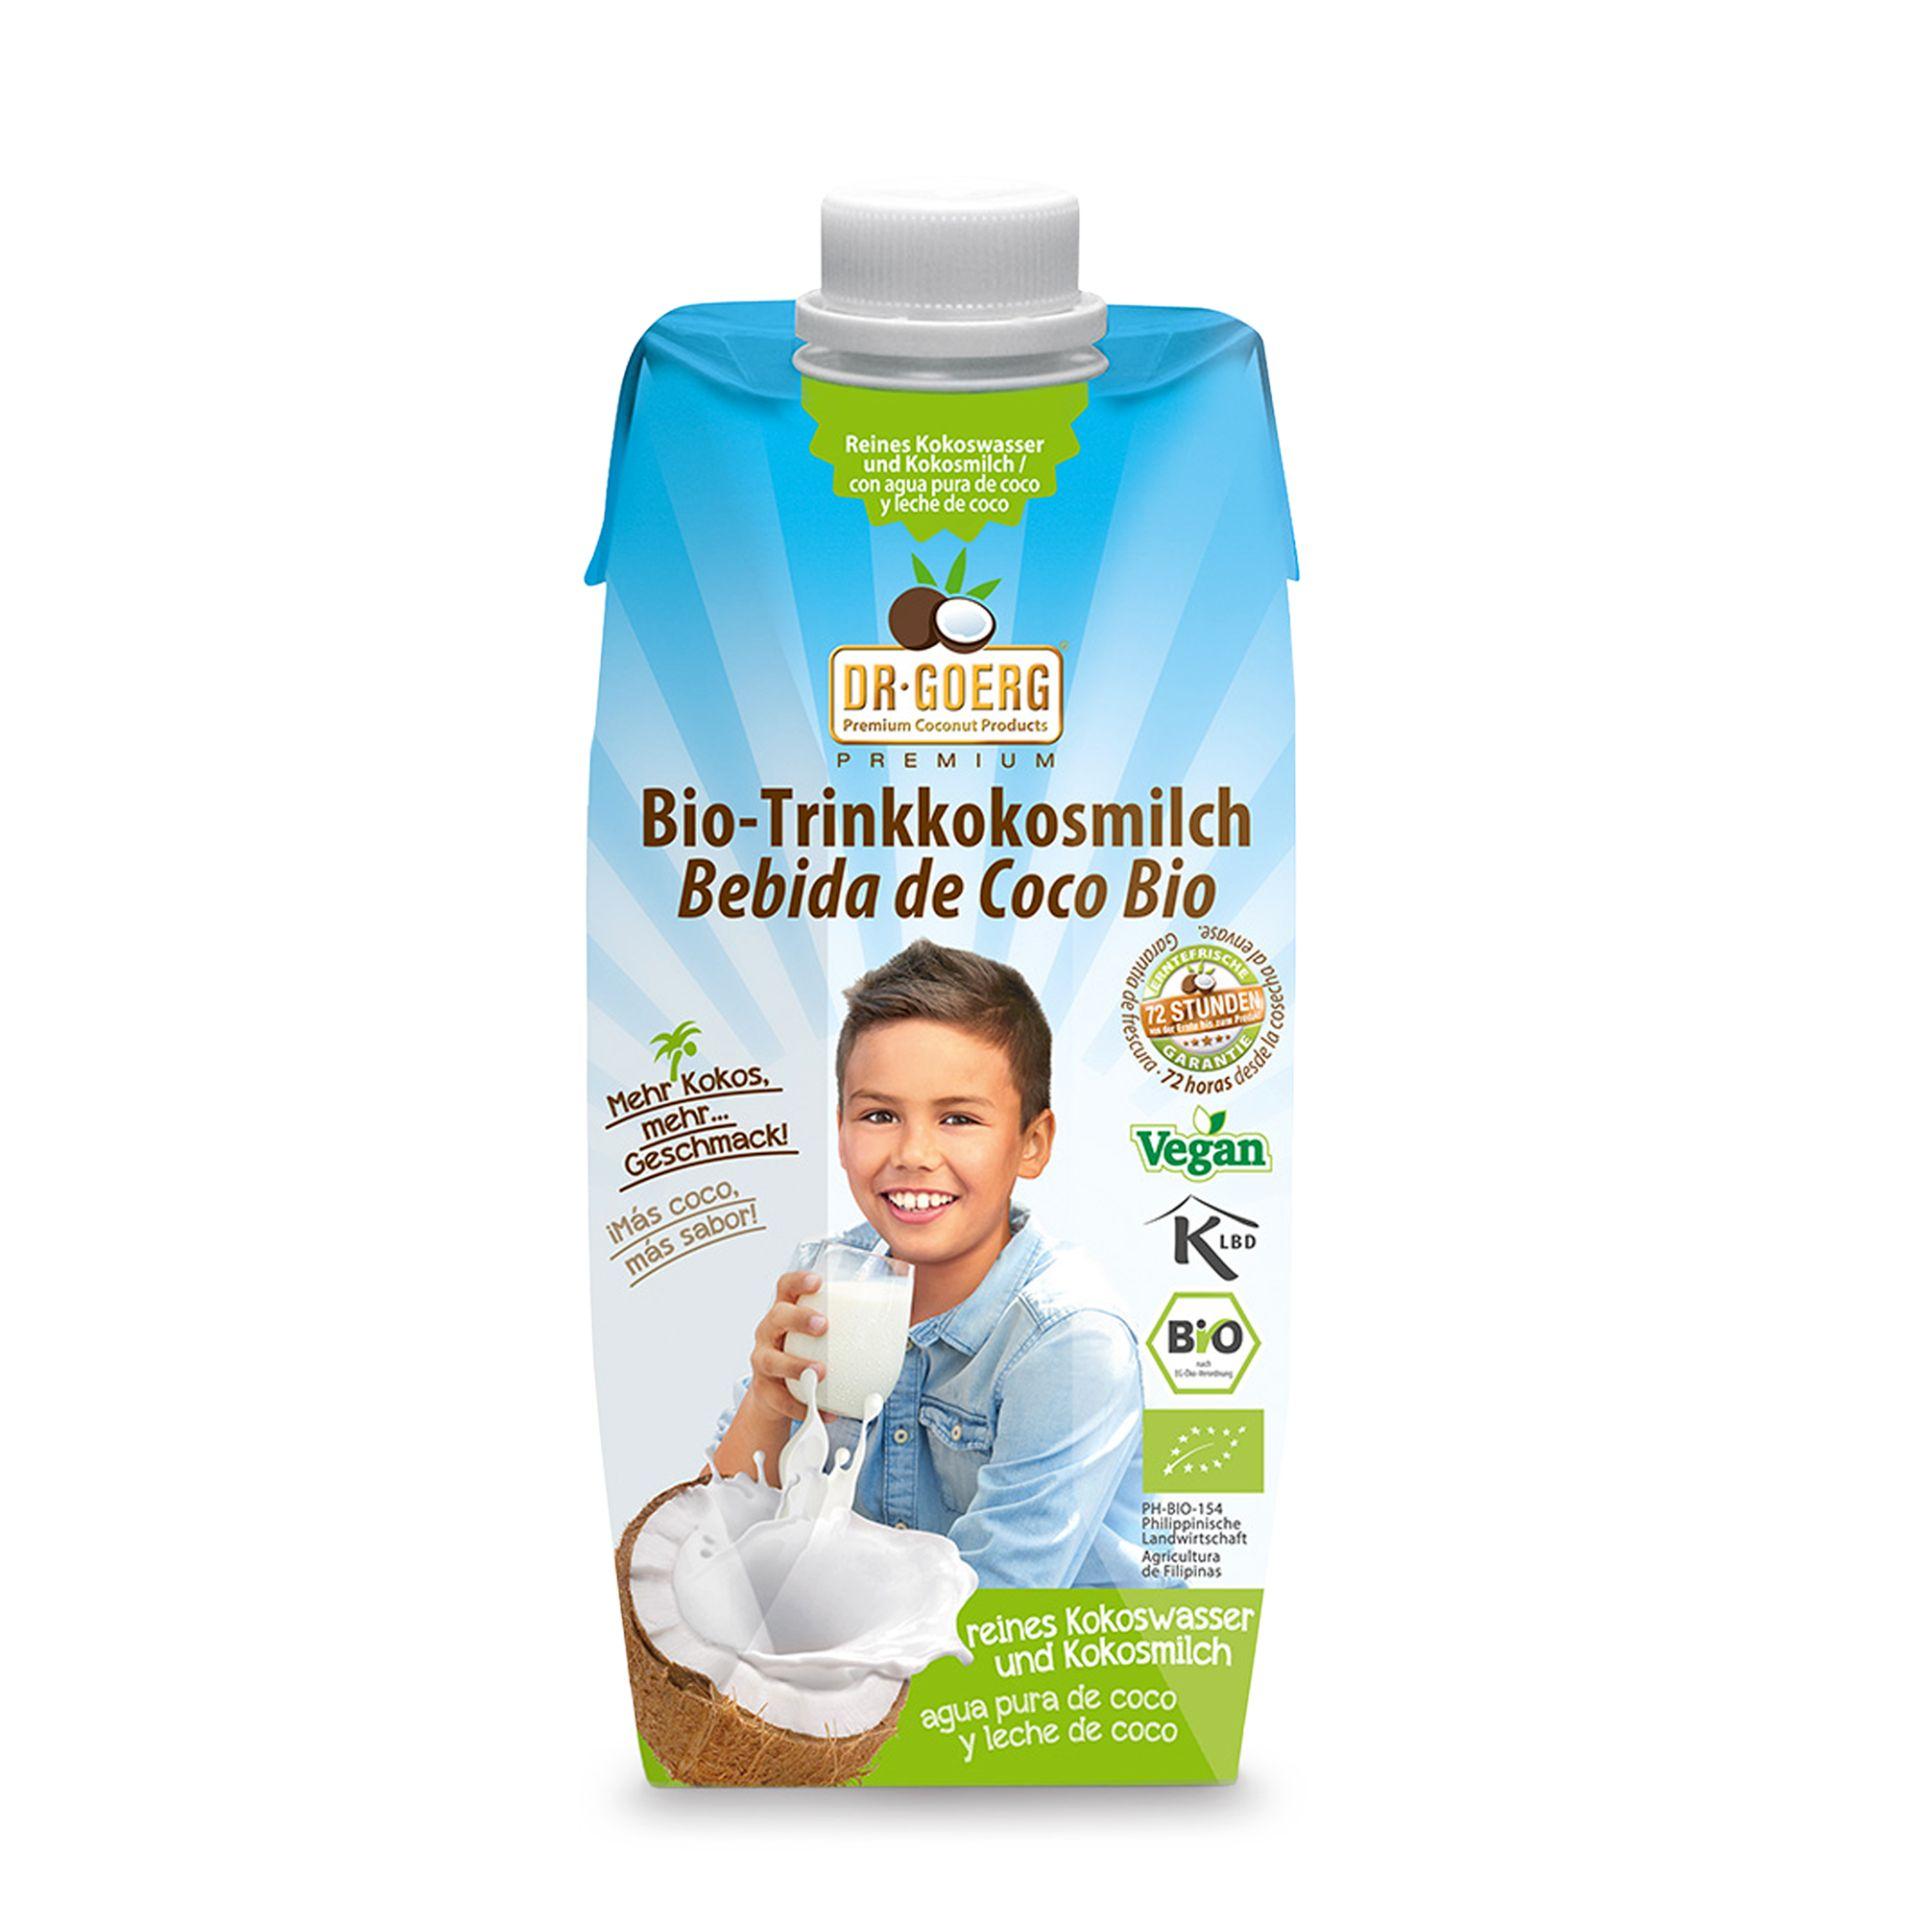 Dr Goerg Trinkkokosmilch im Tetrapak 2er Pack